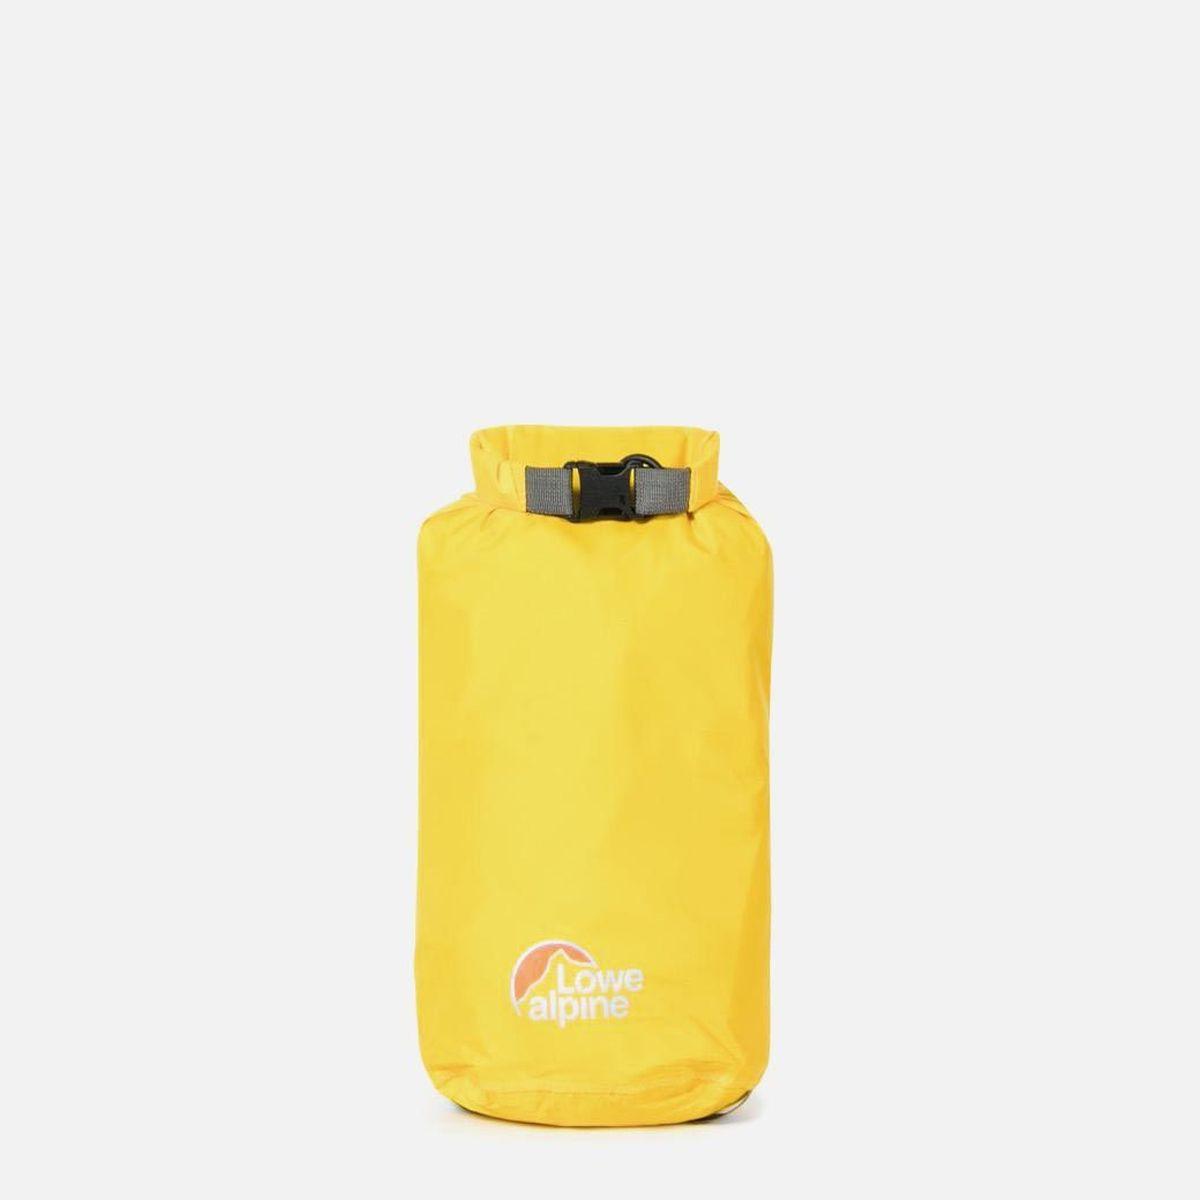 Гермочехол Lowe Alpine Drysack, FAE-55-XS, желтый, размер XS